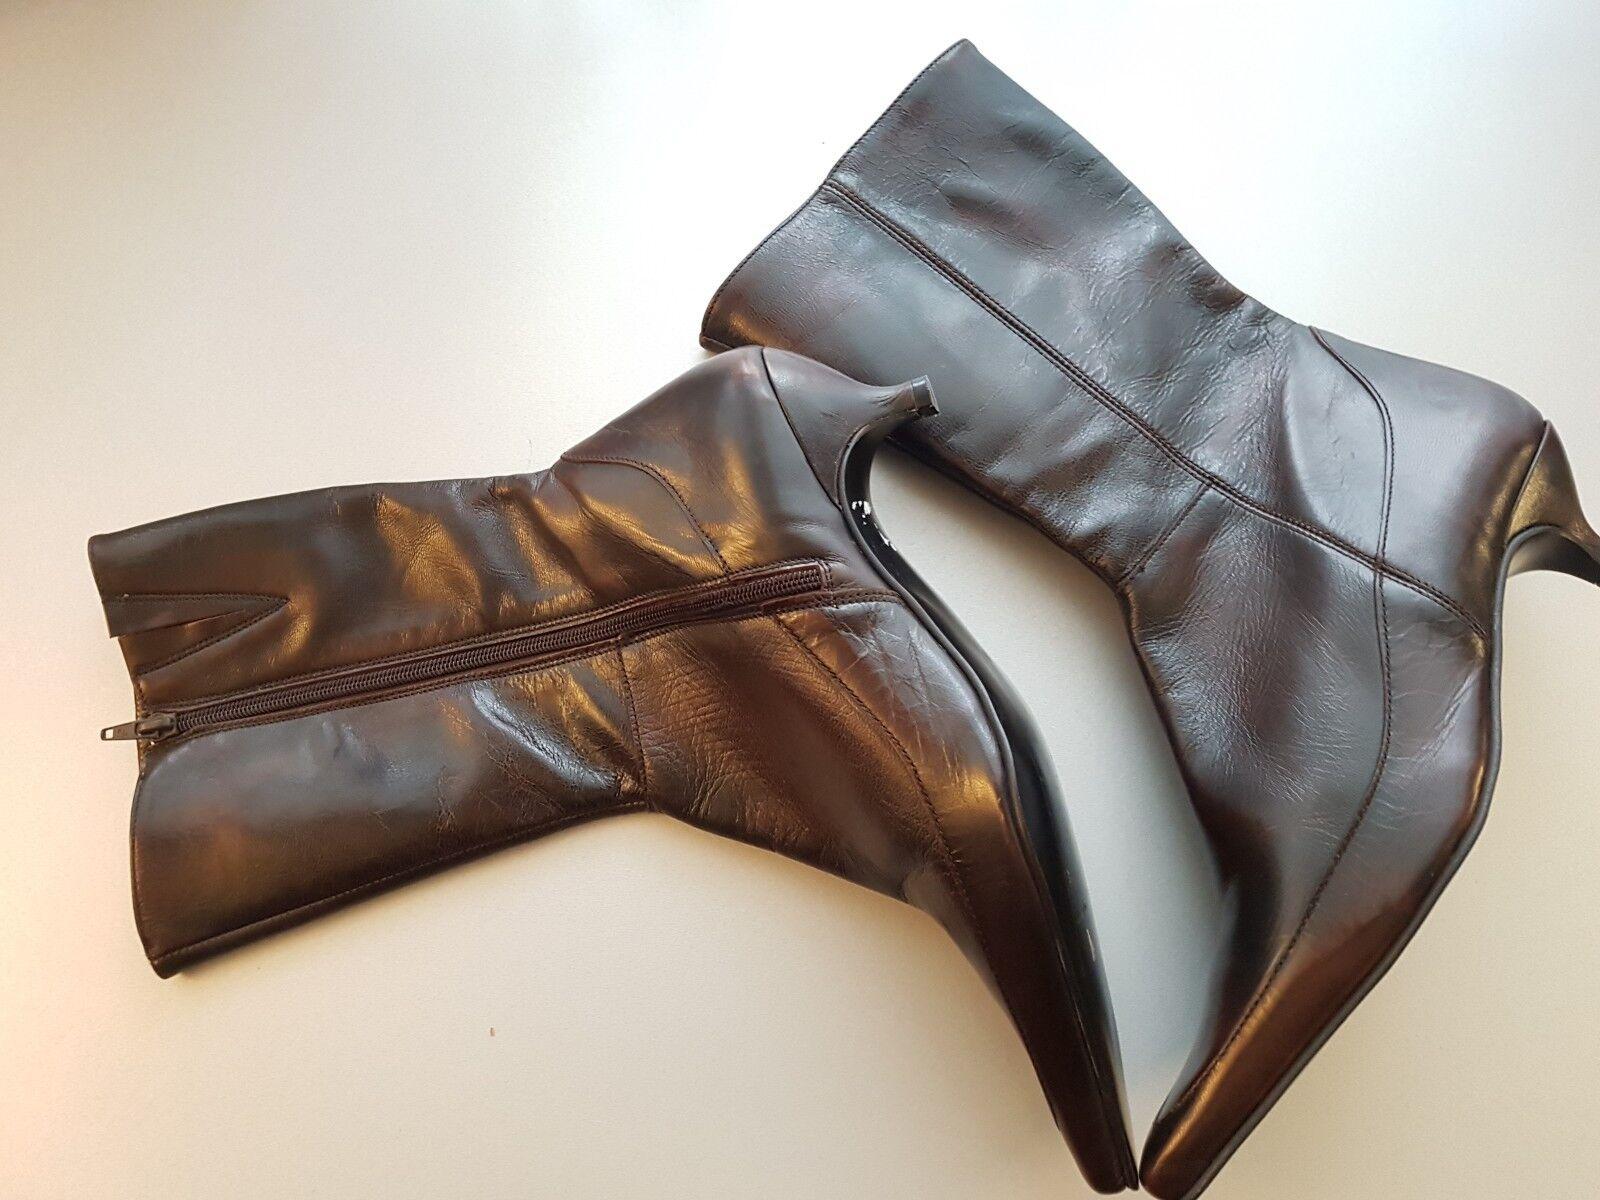 SPM Echtleder Damenstiefel  Boots 40 Stiefeletten braun Gr. 40 Boots c5b8a7